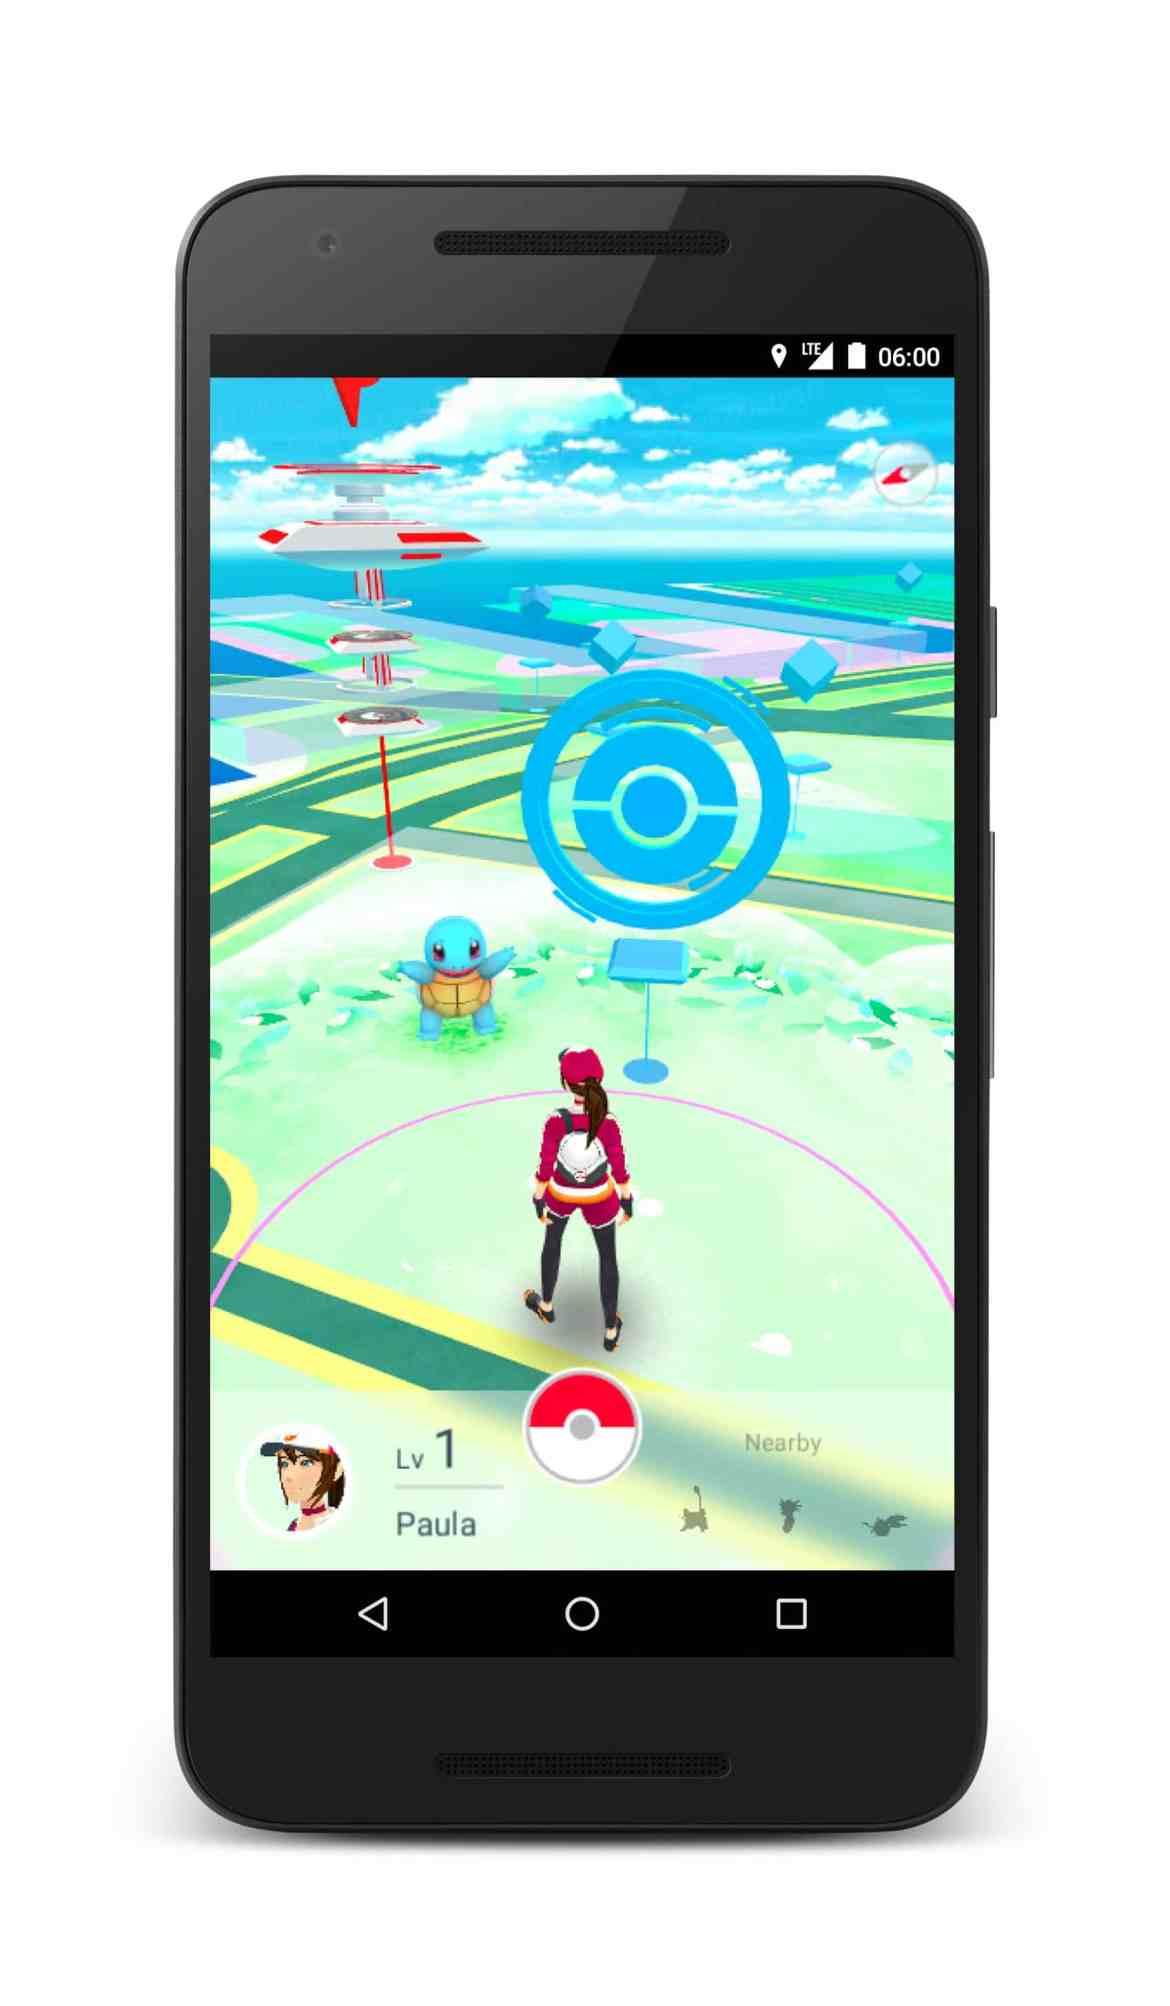 pokemon-go-map-view-screenshot-2